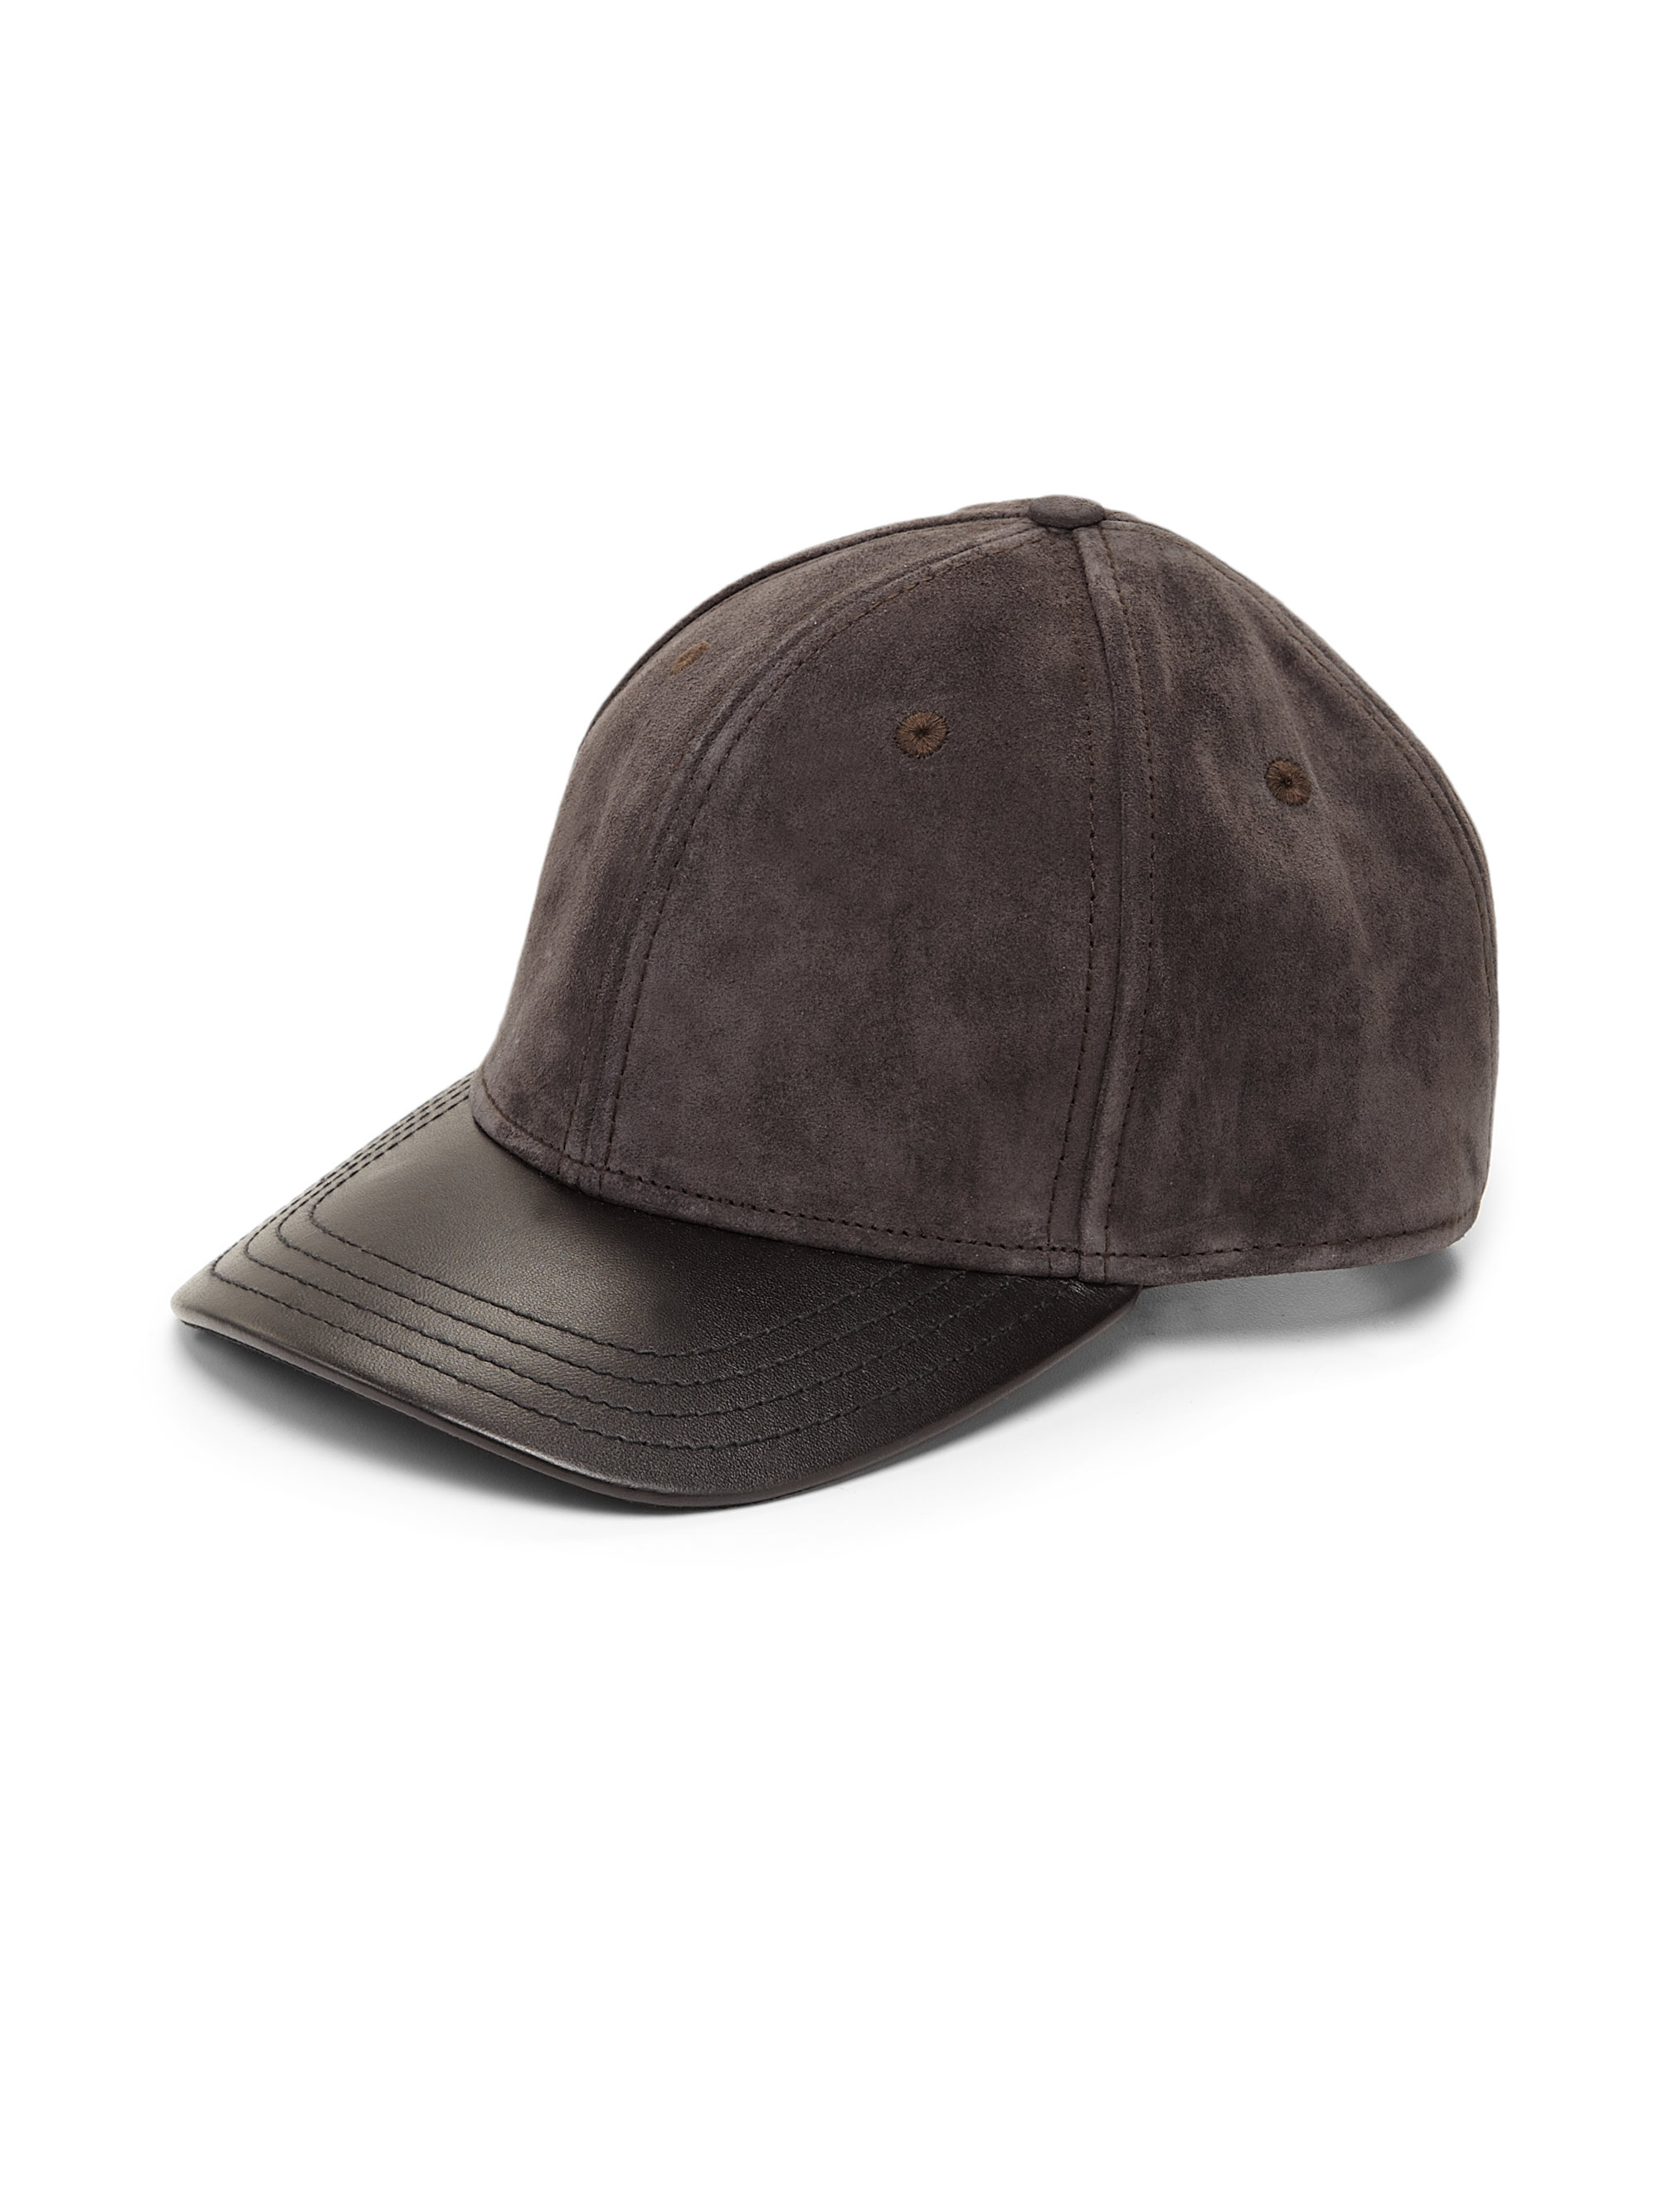 how to clean black baseball caps